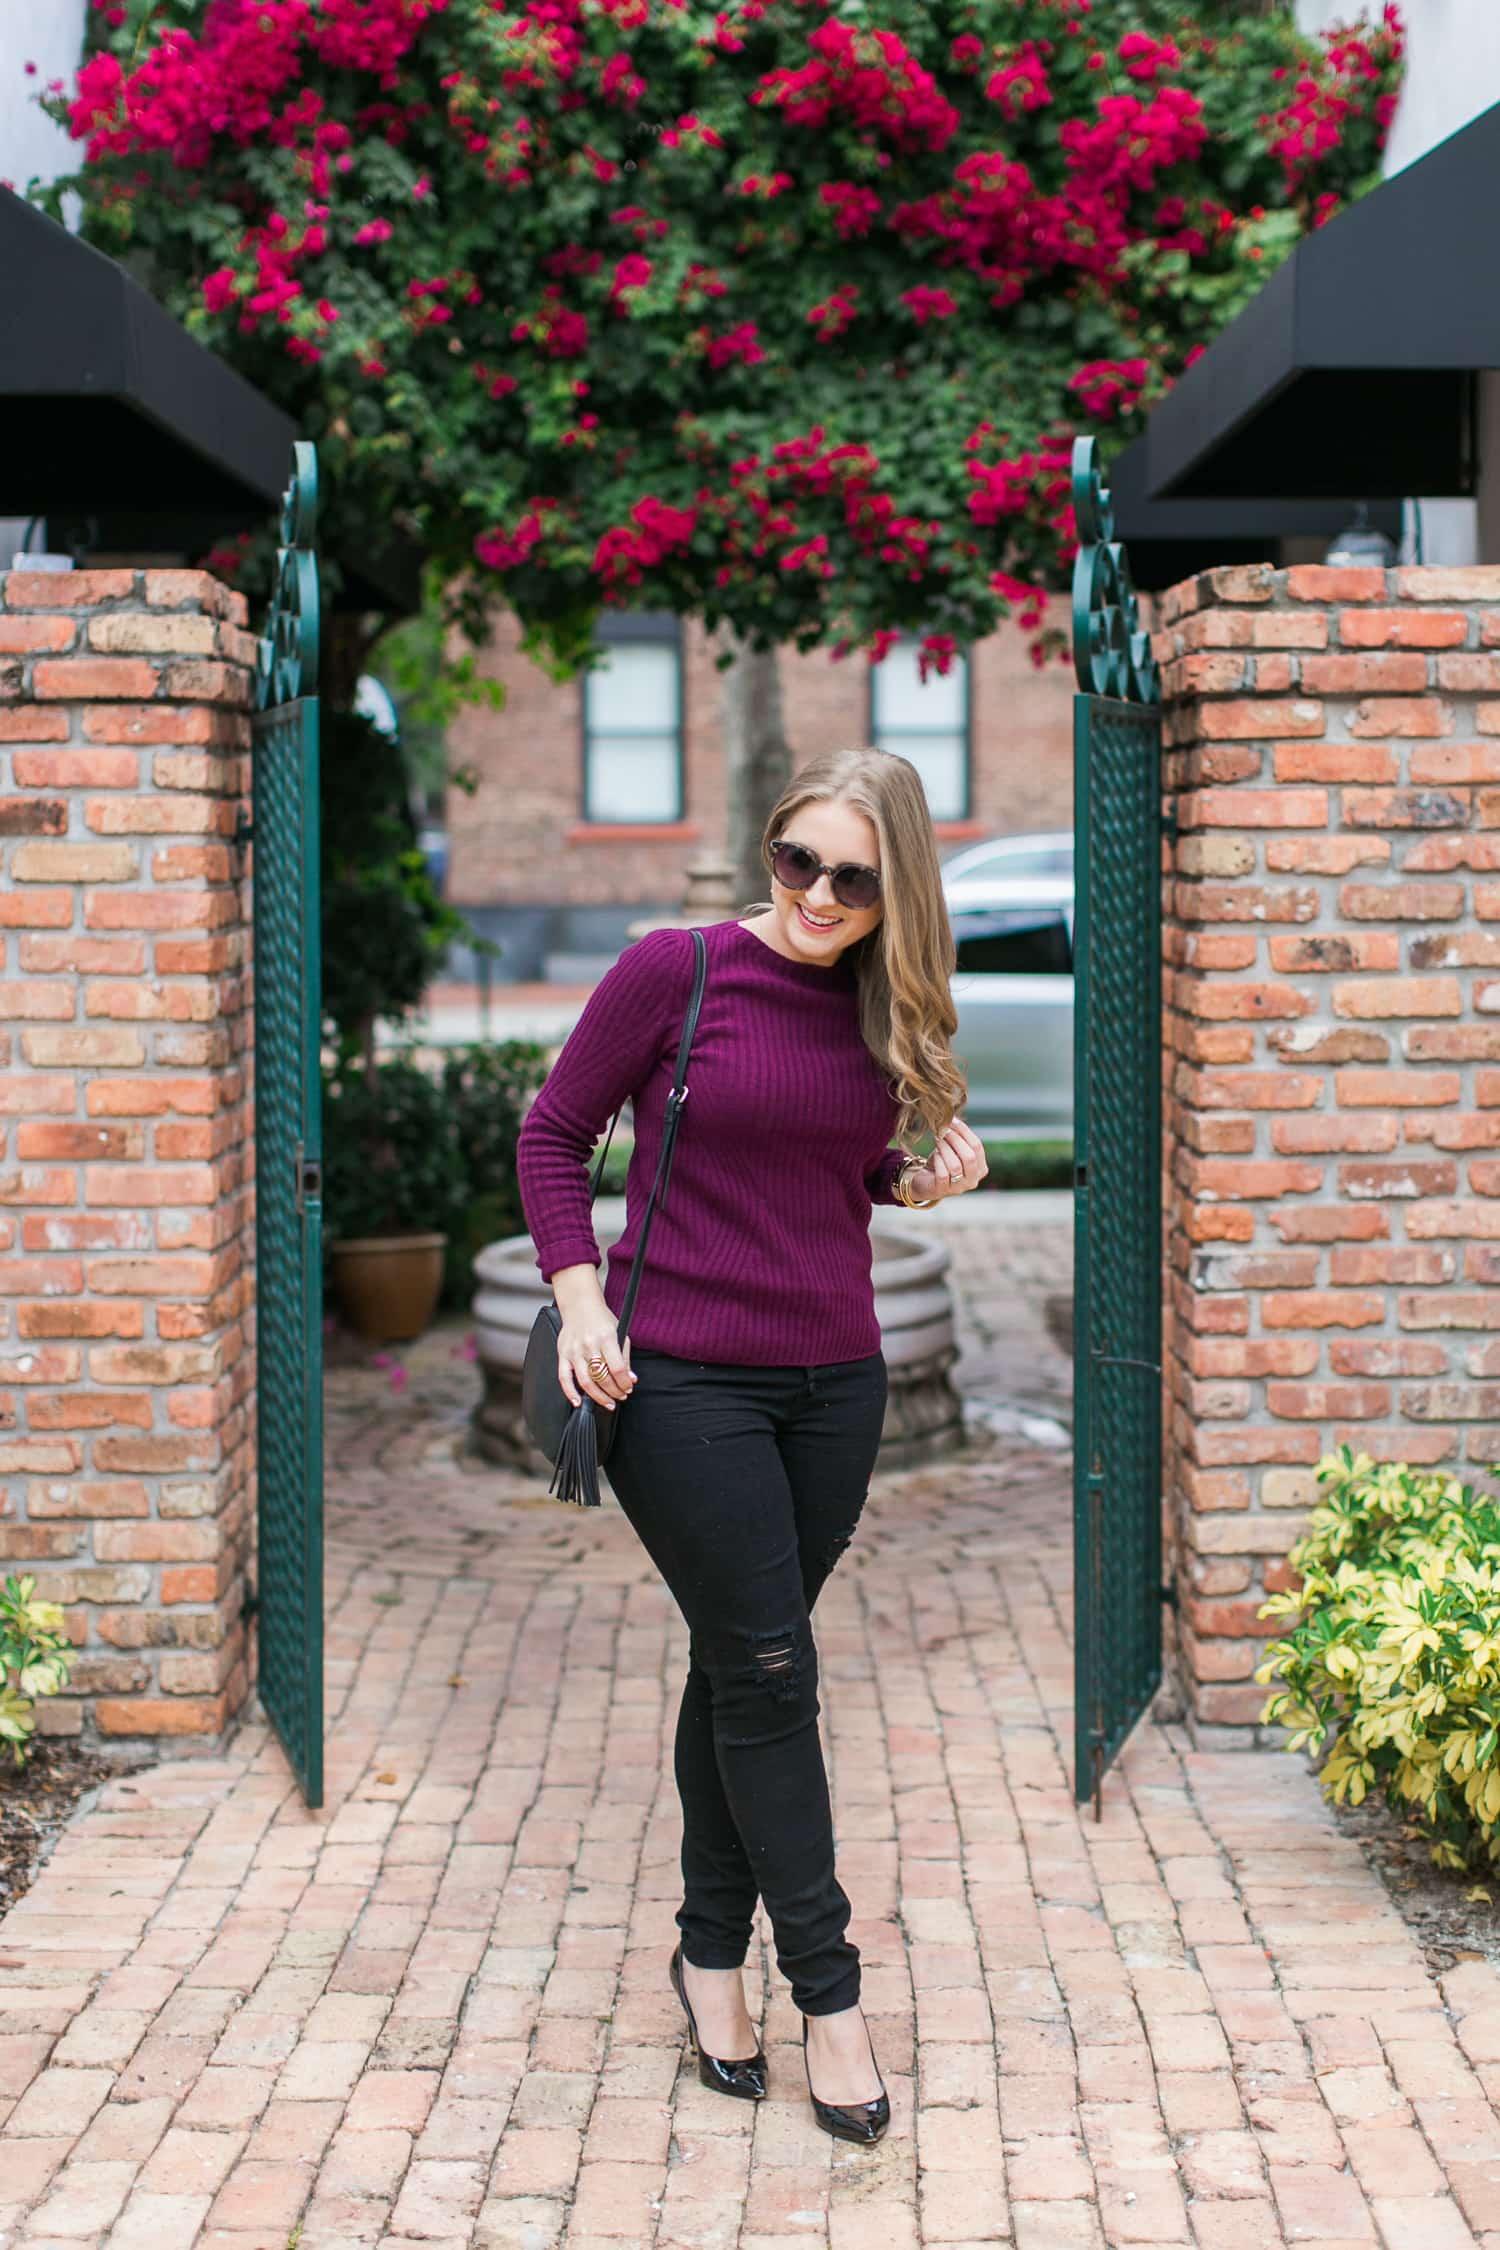 black-ripped-jeans-retro-round-sunglasses-burgundy-cashmere-sweater-black-pointy-toe-pumps-tassel-handbag-001